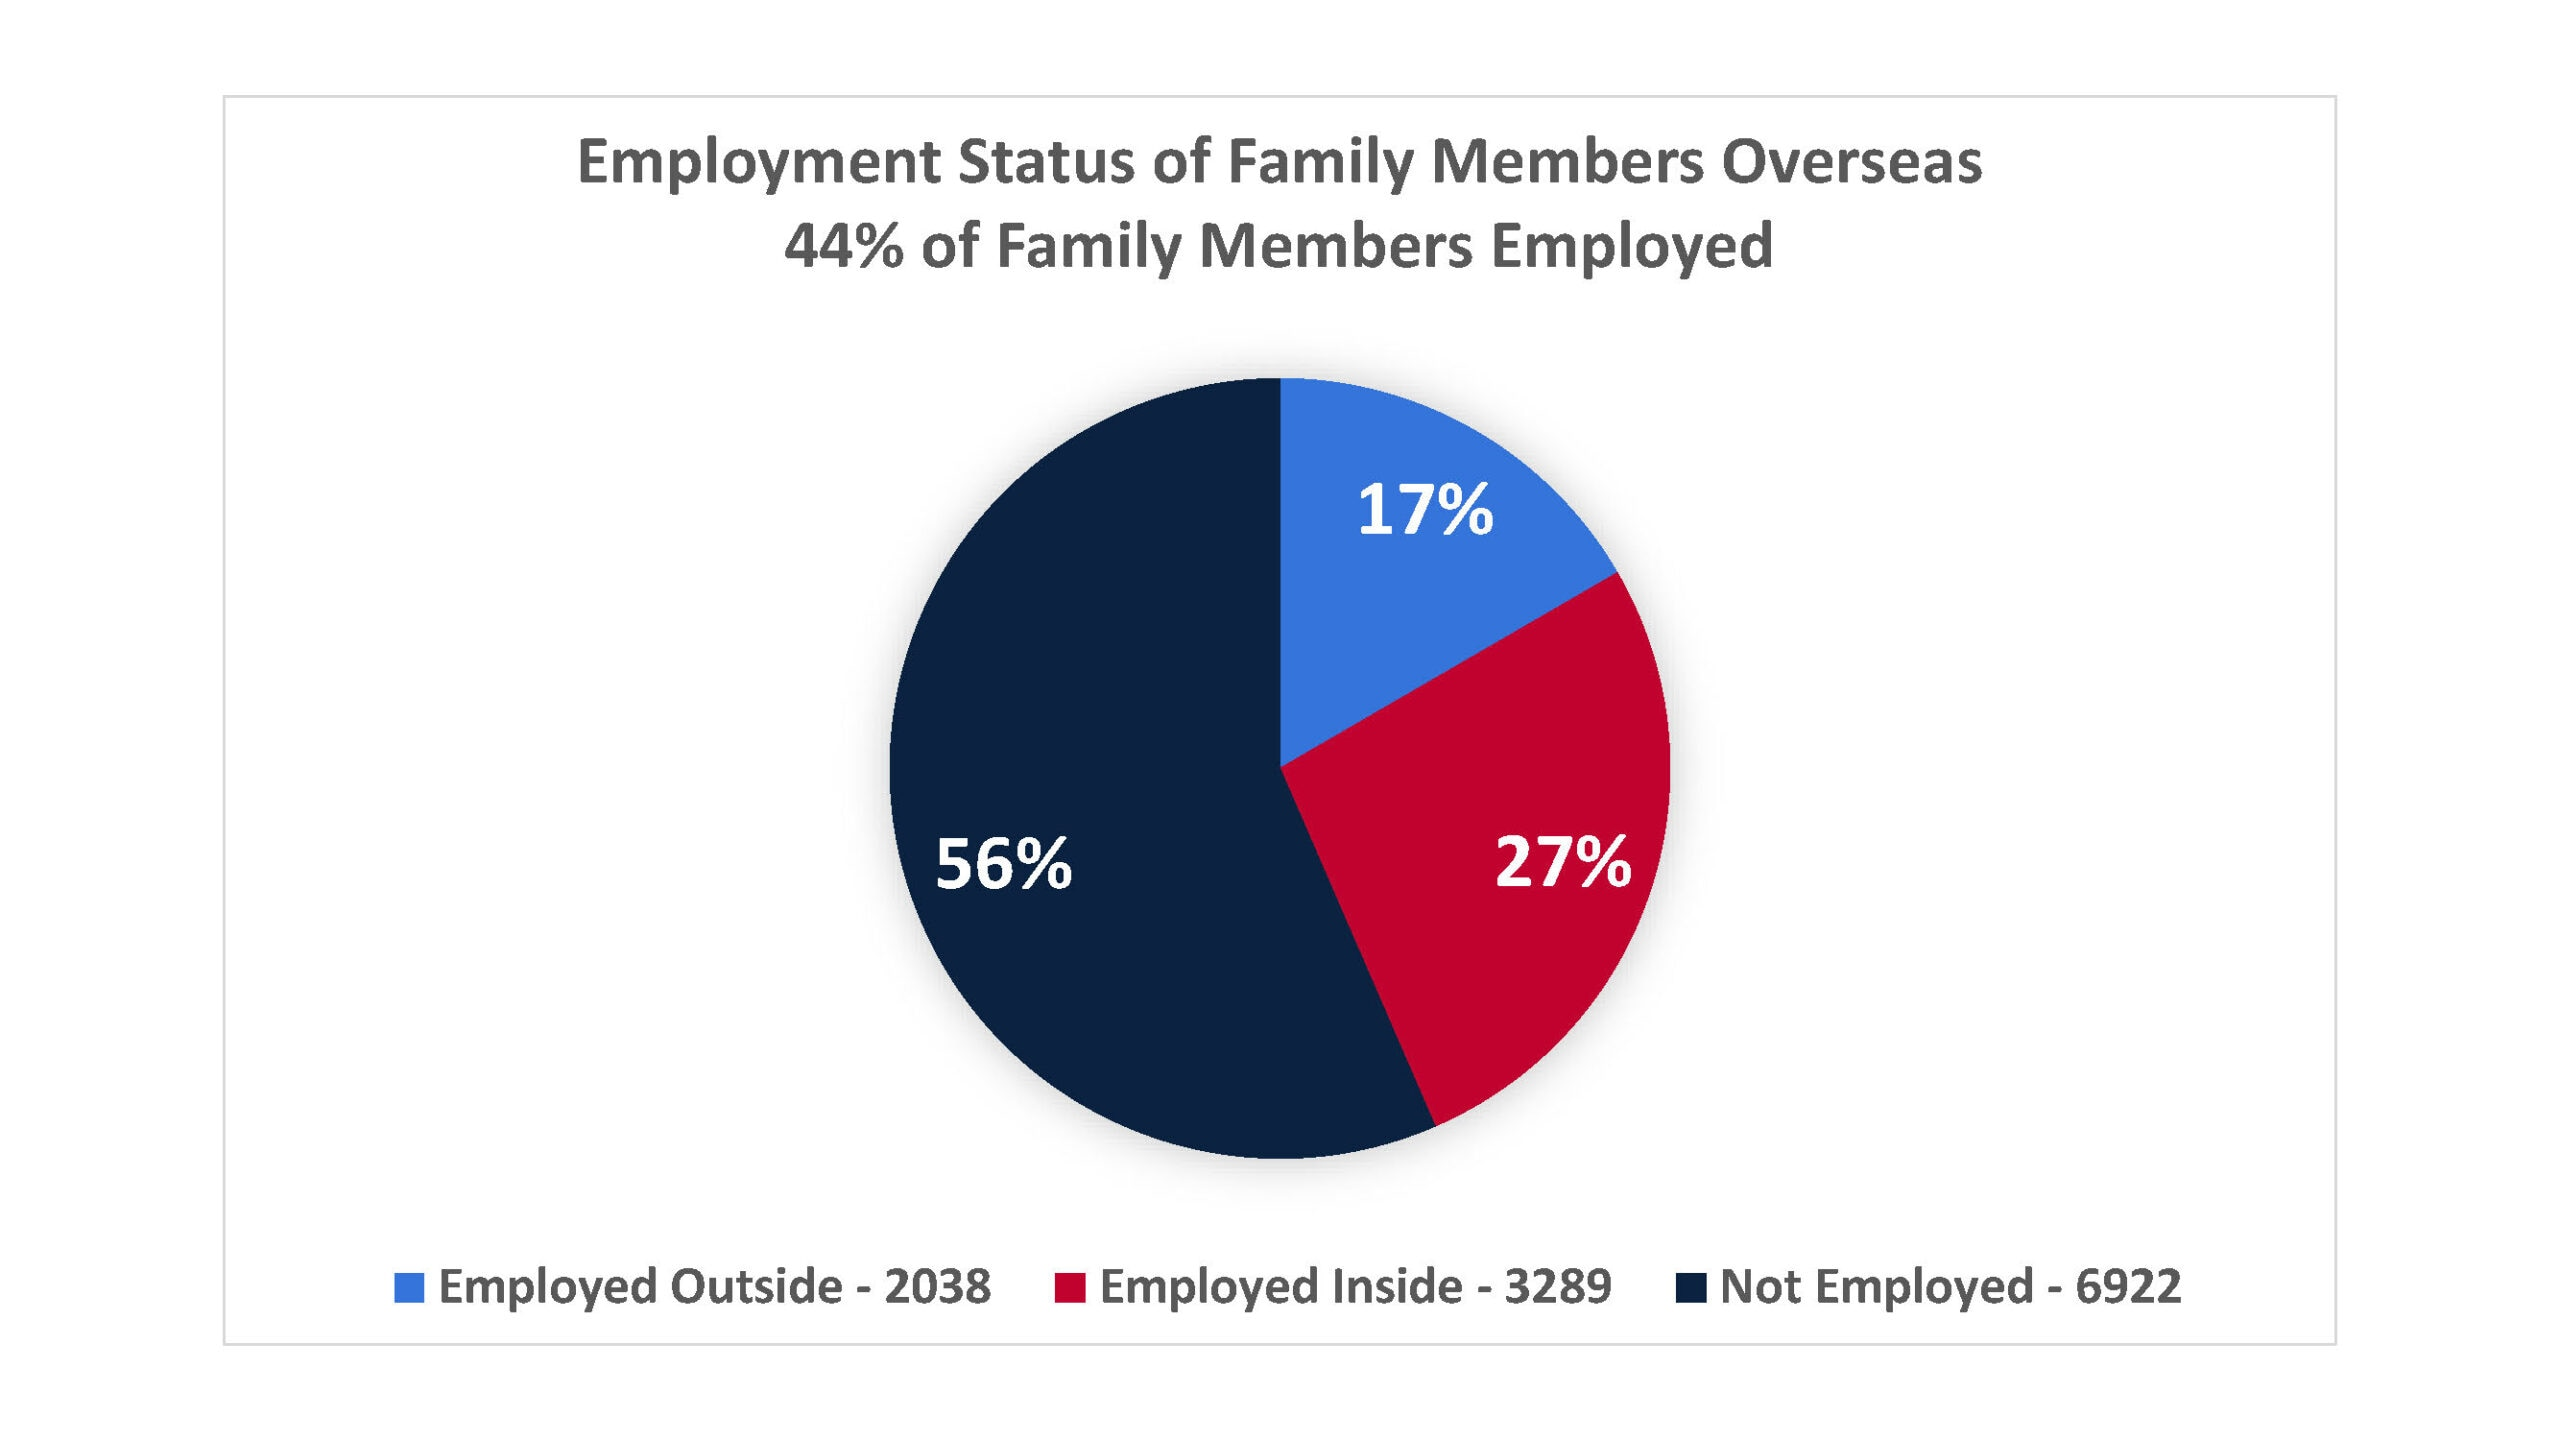 Employment Status of Family Members Overseas - 44% of Family Members Employed